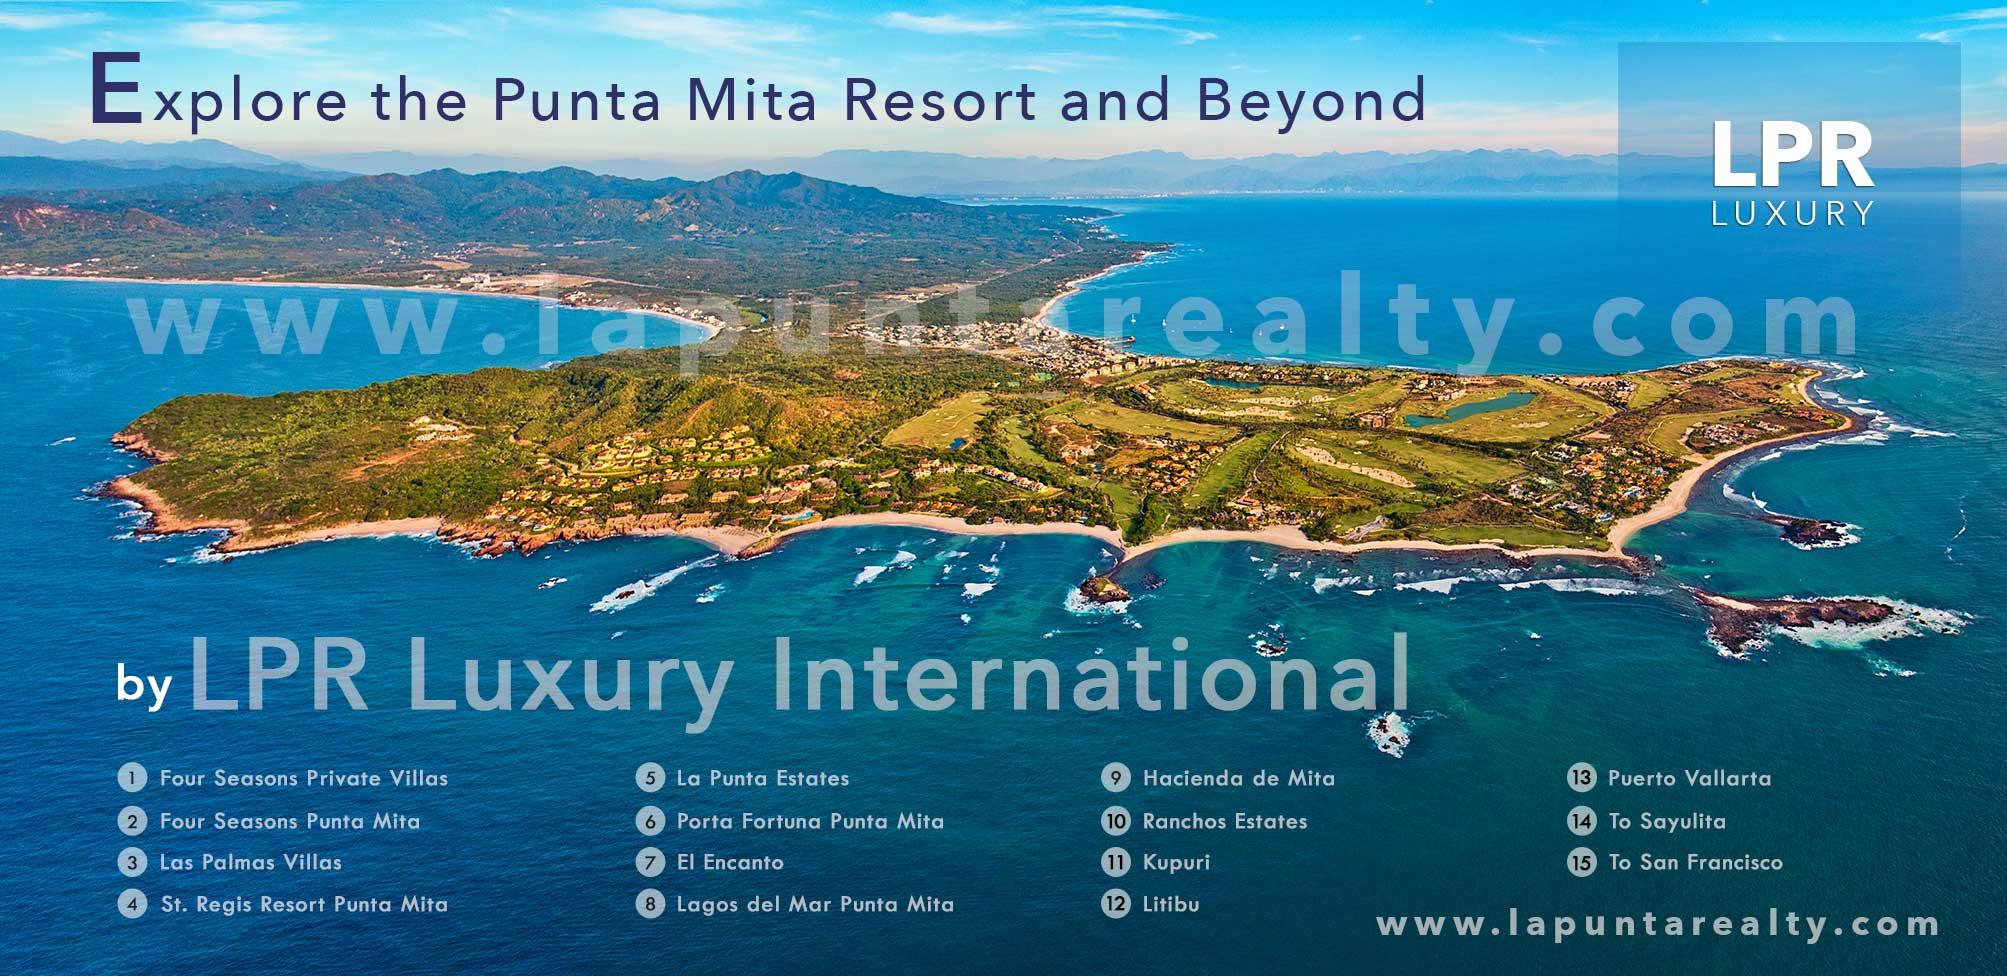 Explore the Punta Mita Four Seasons / St. Regis Resort - Mexico